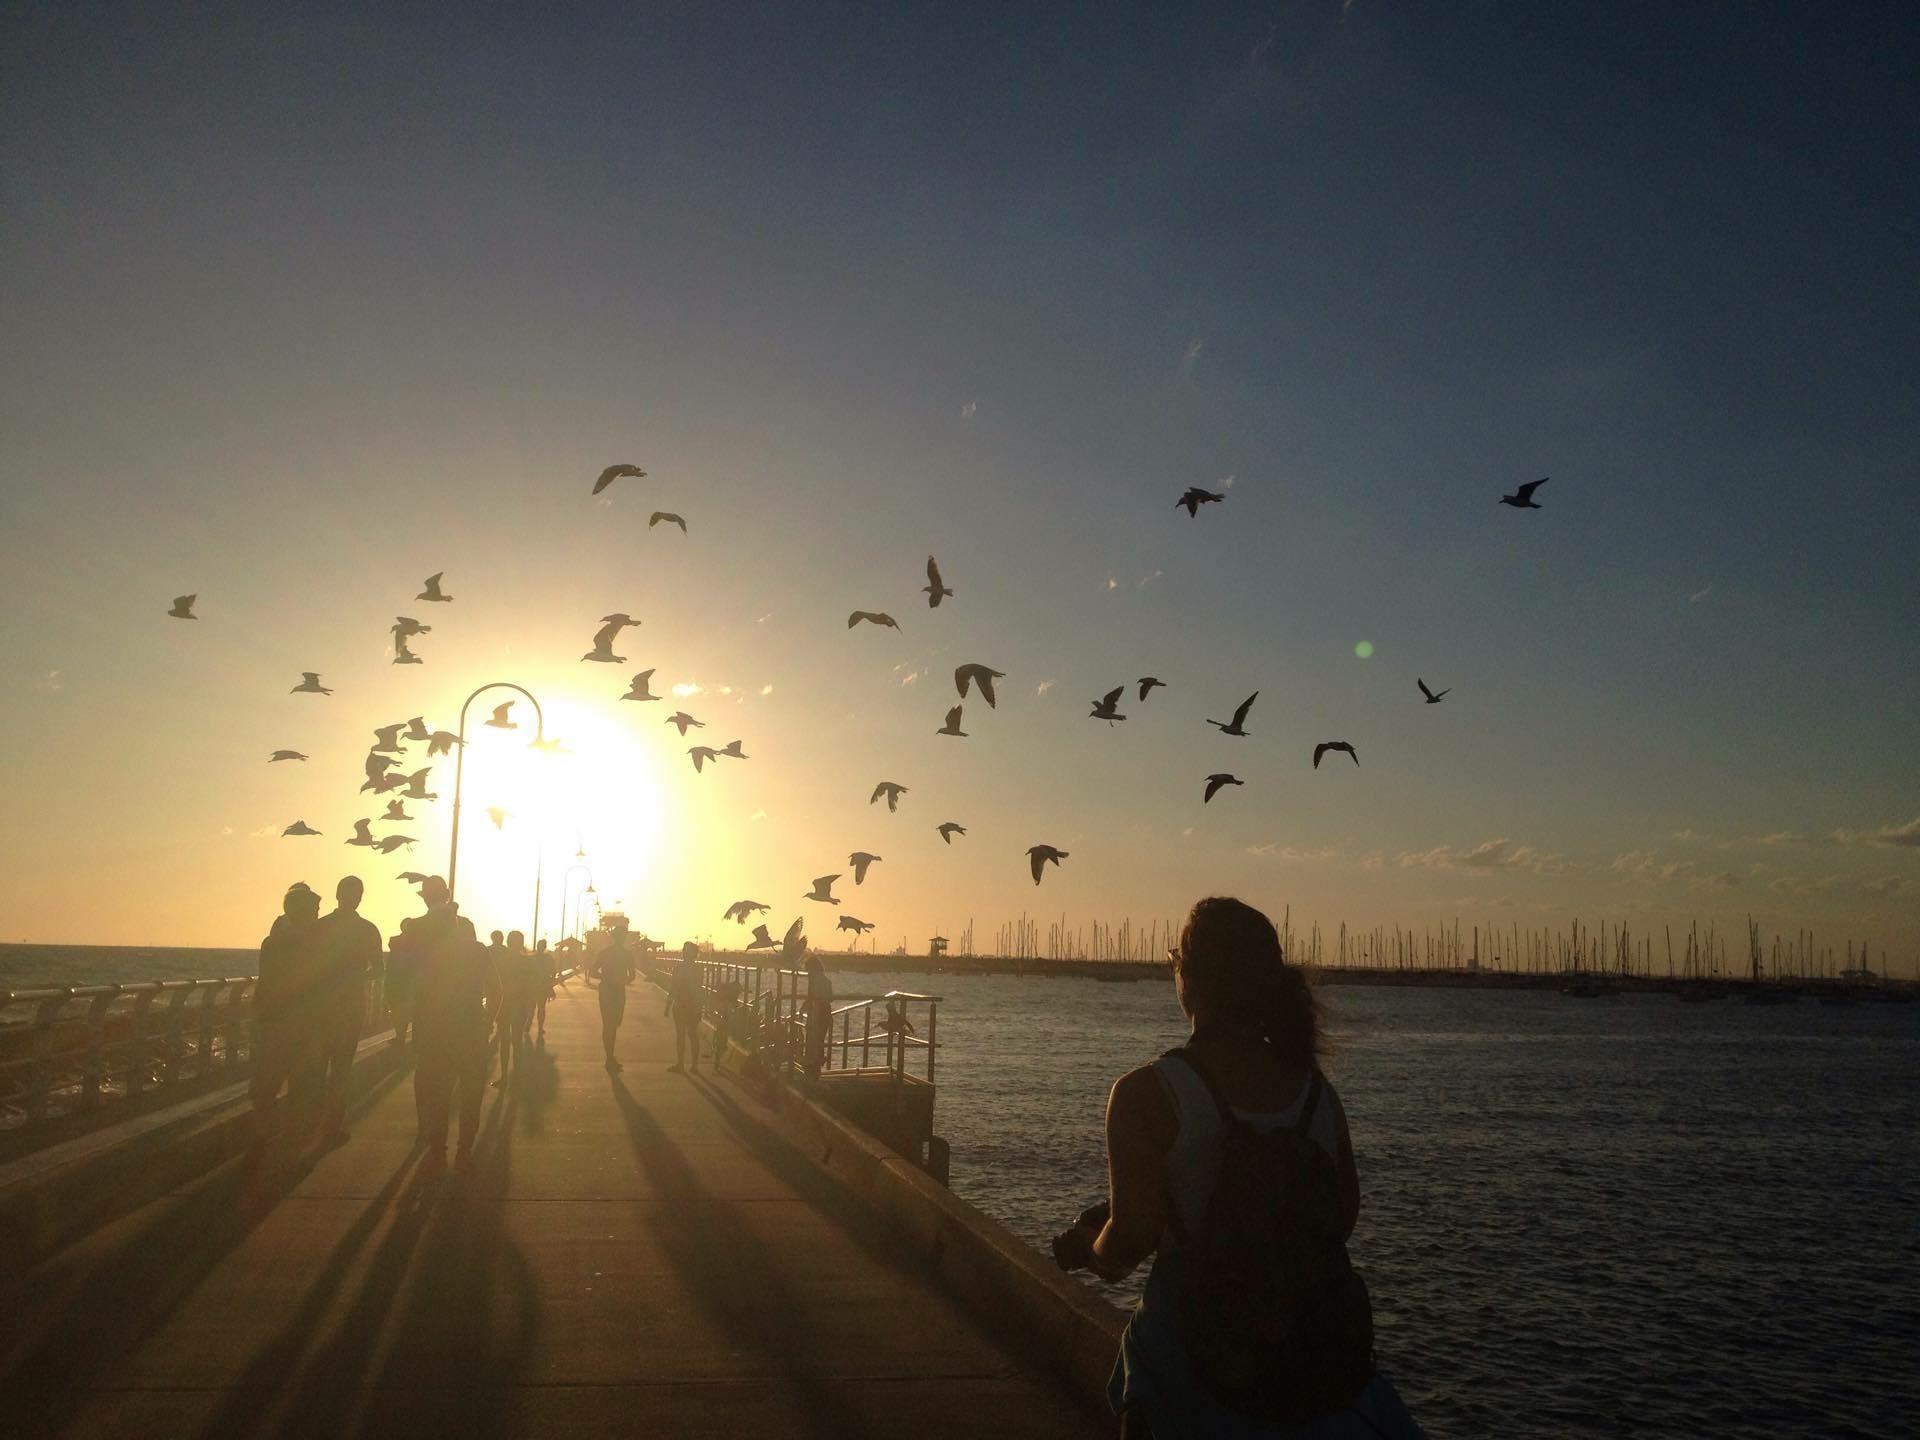 Auringonlasku, lentäviä lintuja.